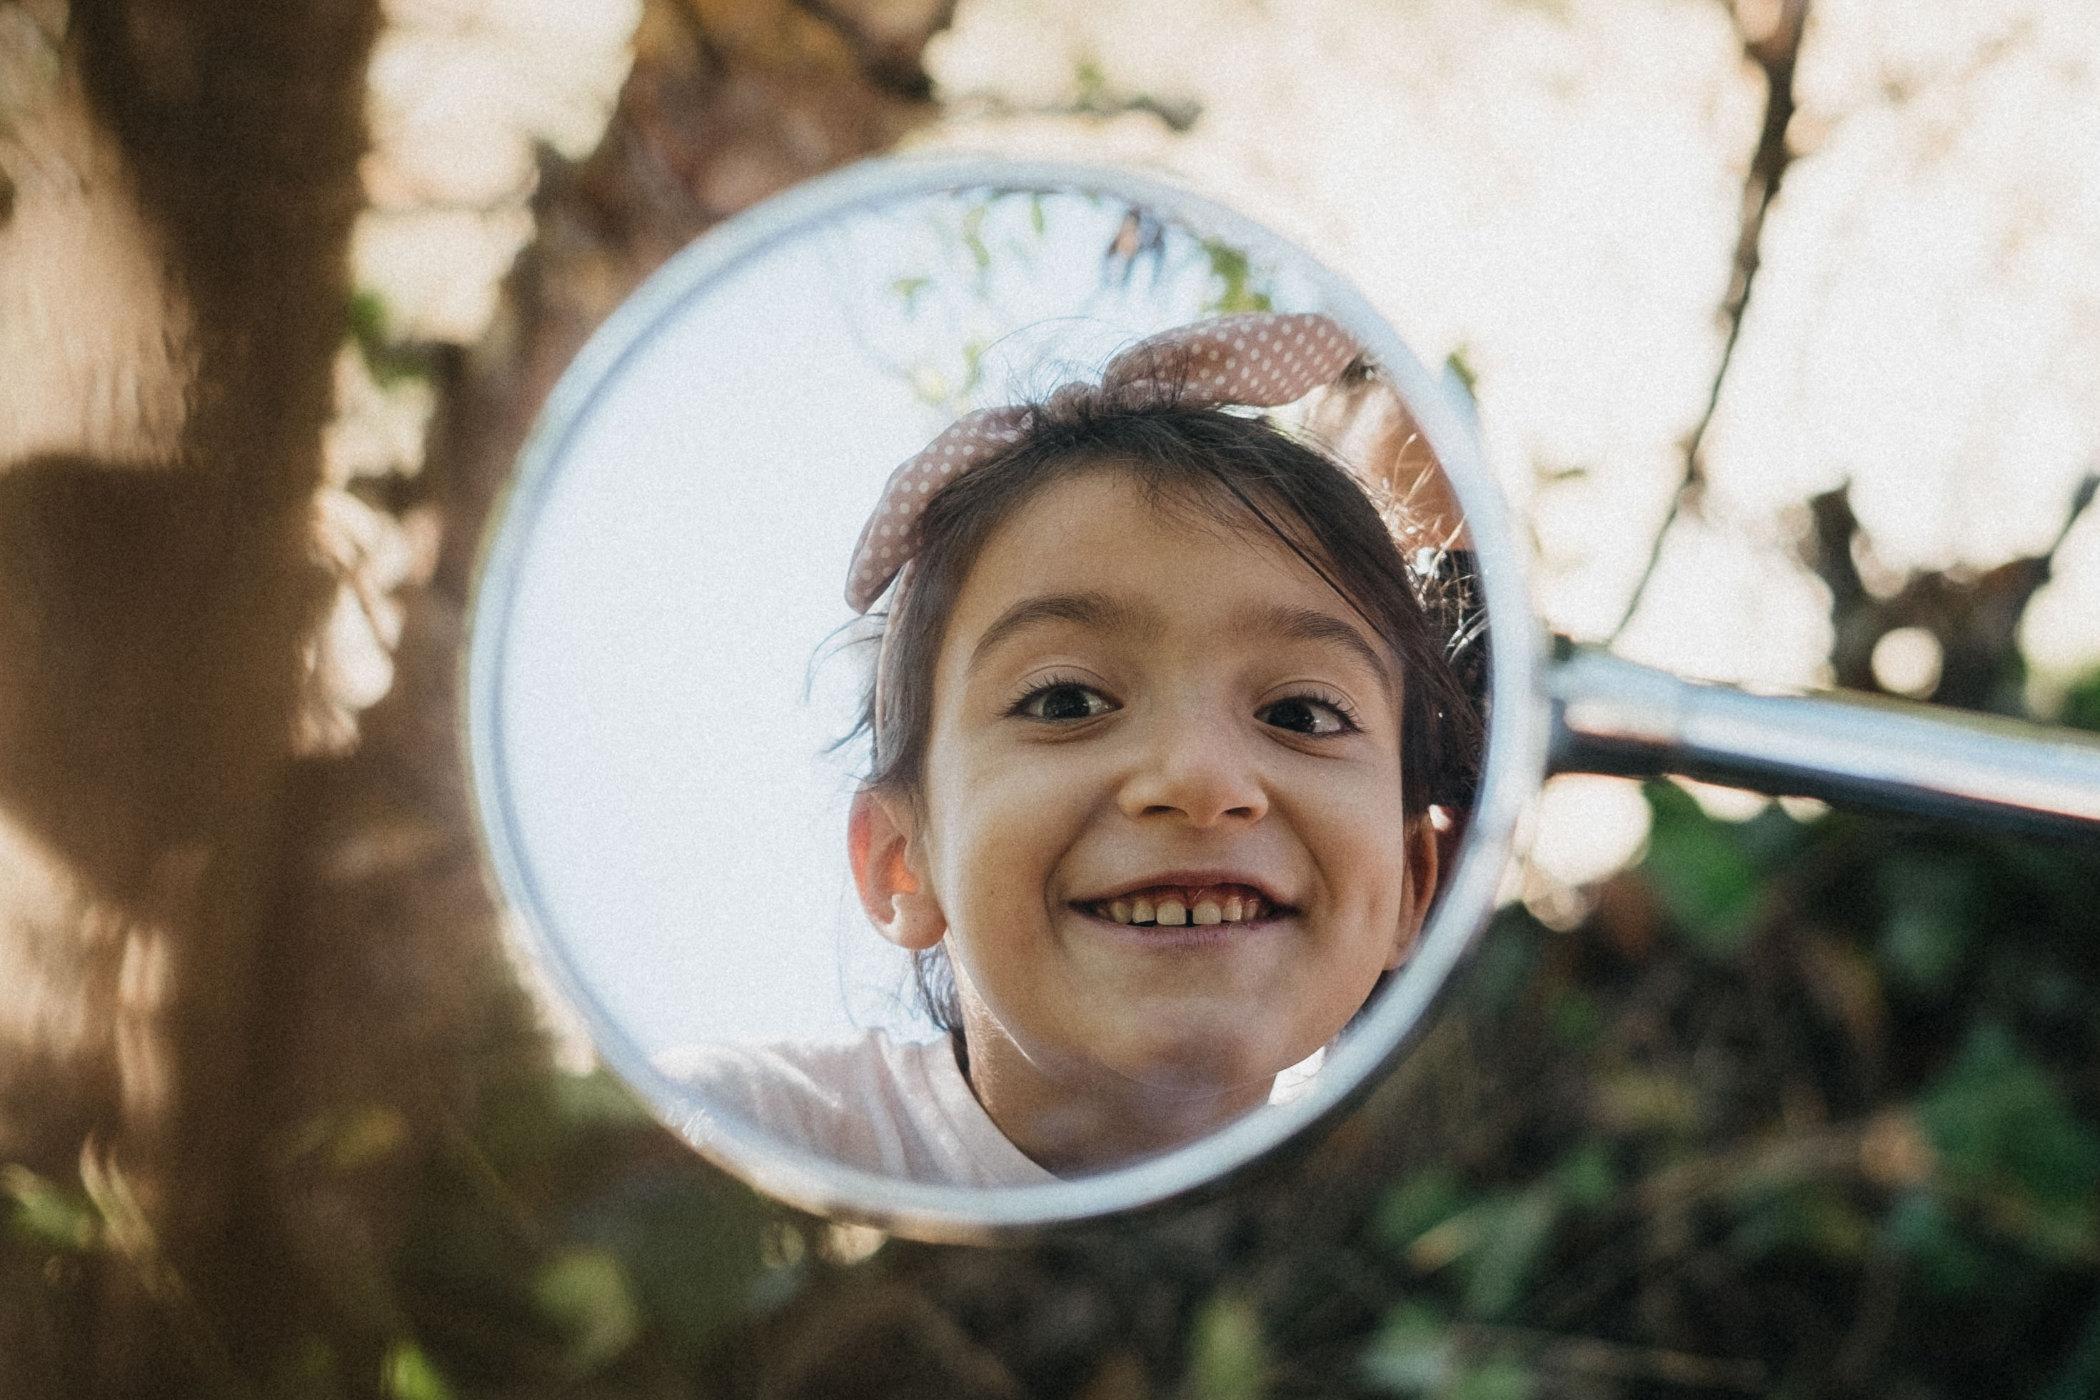 Mirror reflection of a girl, portrait by Pauline Mattia